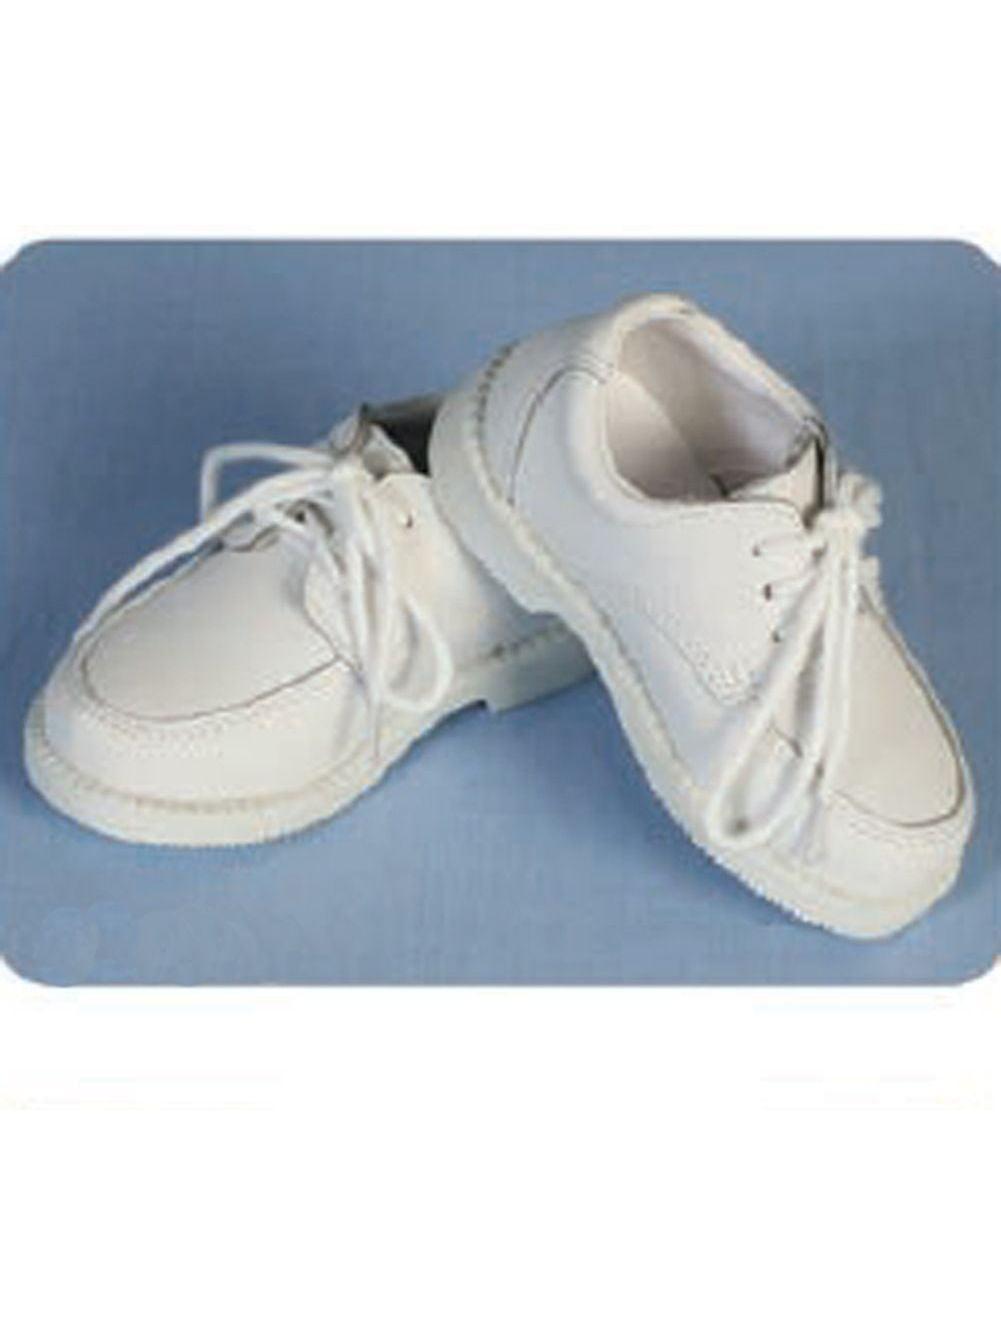 Angels Garment Toddler Little Boy 5-4 White Top Sider Christening Shoe